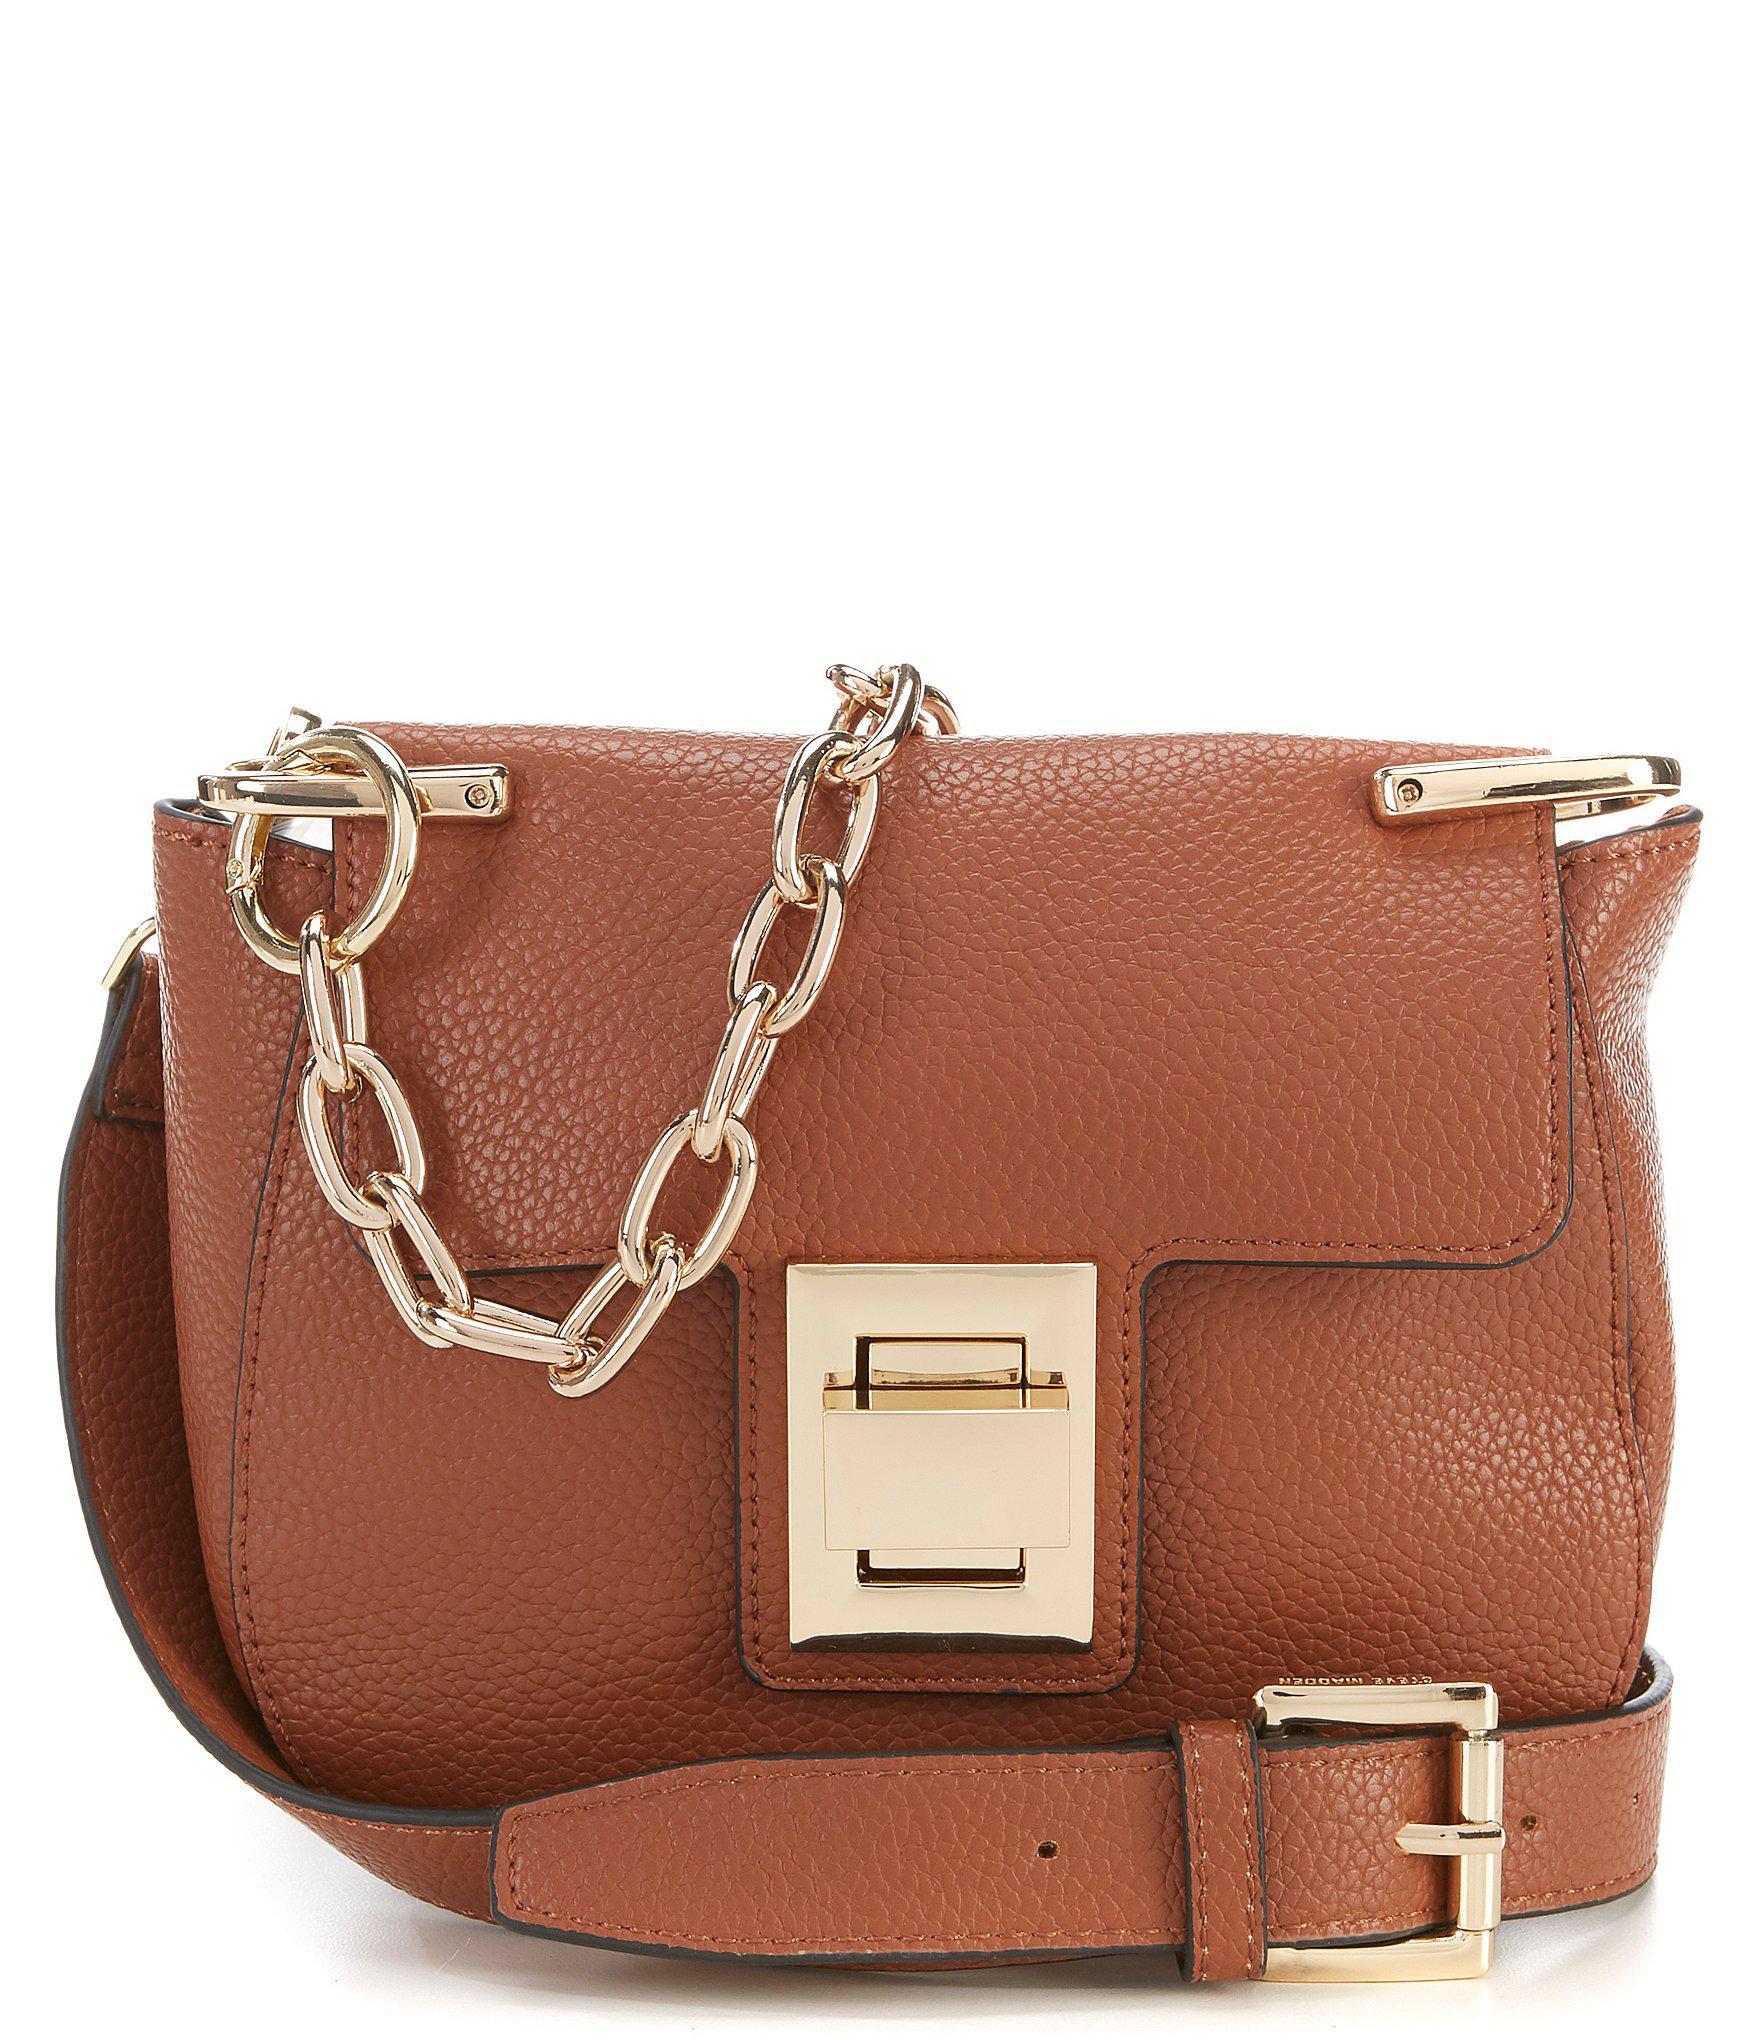 9799066edd Steve Madden Kaia Chain Cross-body Bag in Brown - Lyst